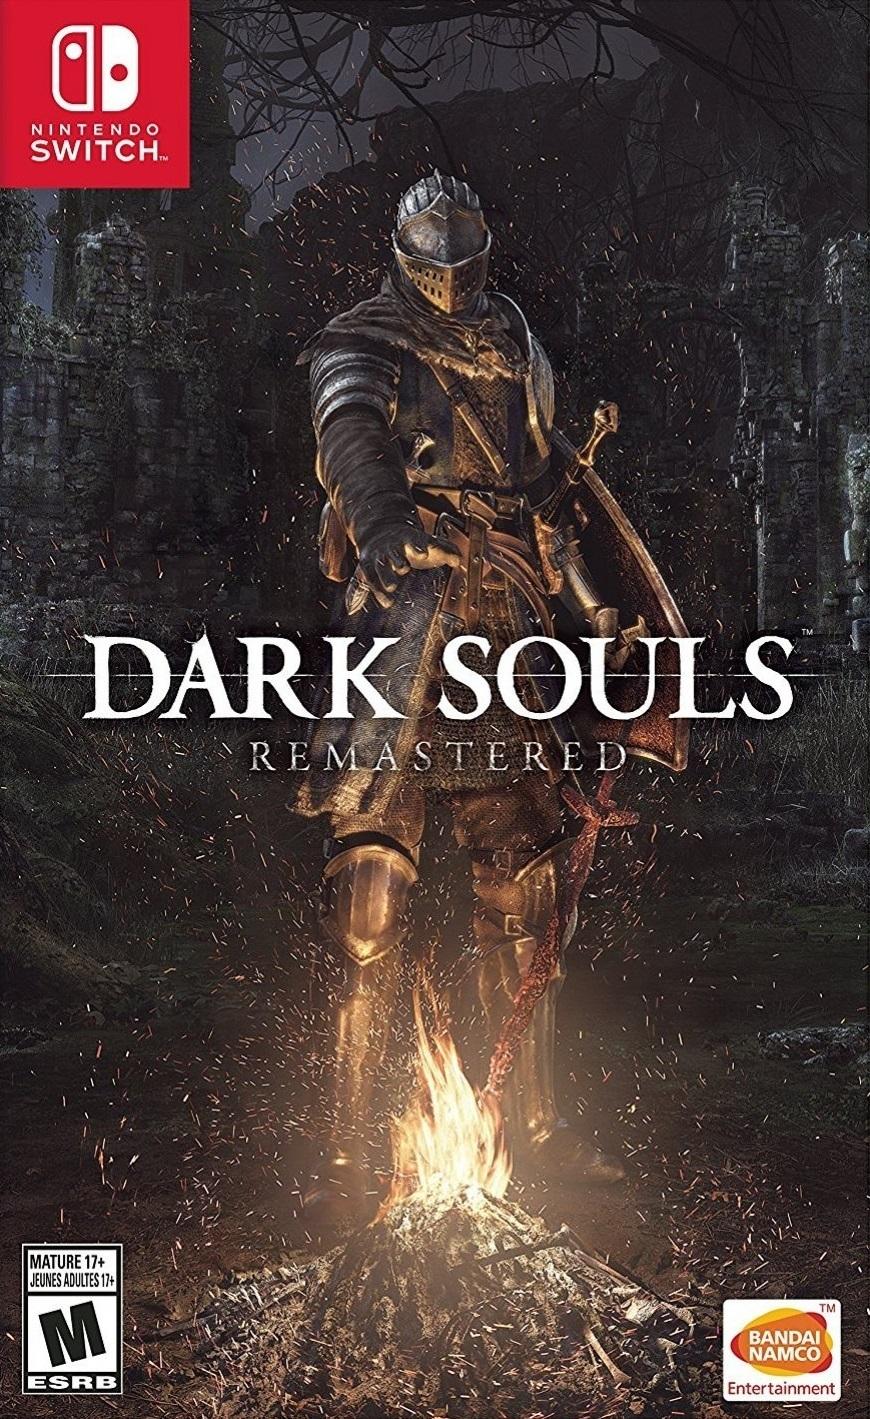 Dark souls remastered clipart clip art freeuse download NS: Dark Souls Remastered [ENG/CHI AS Ver.] clip art freeuse download